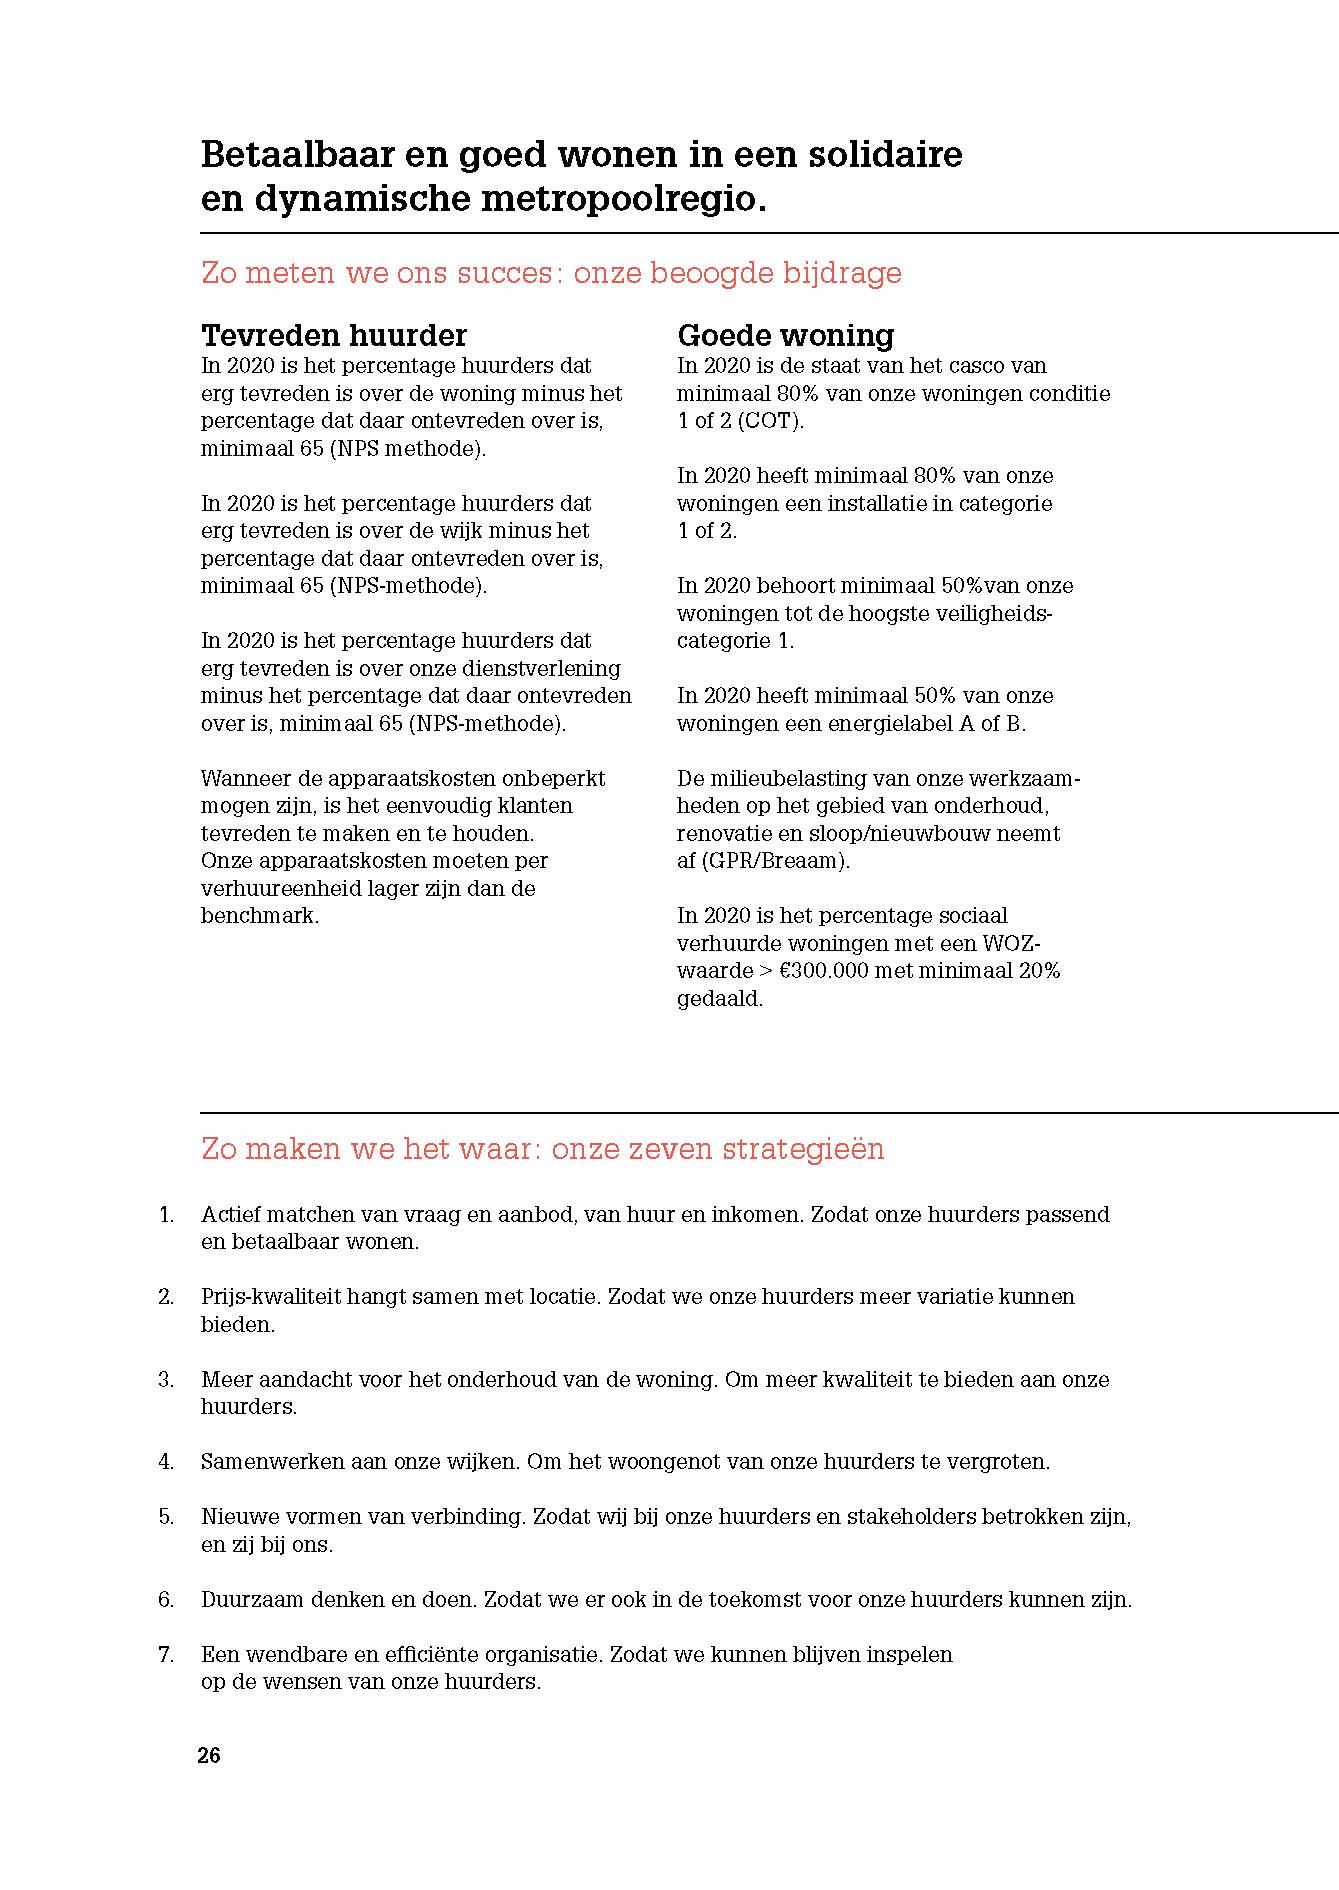 ymere_strategie2015_023_17x24rgb_page_26